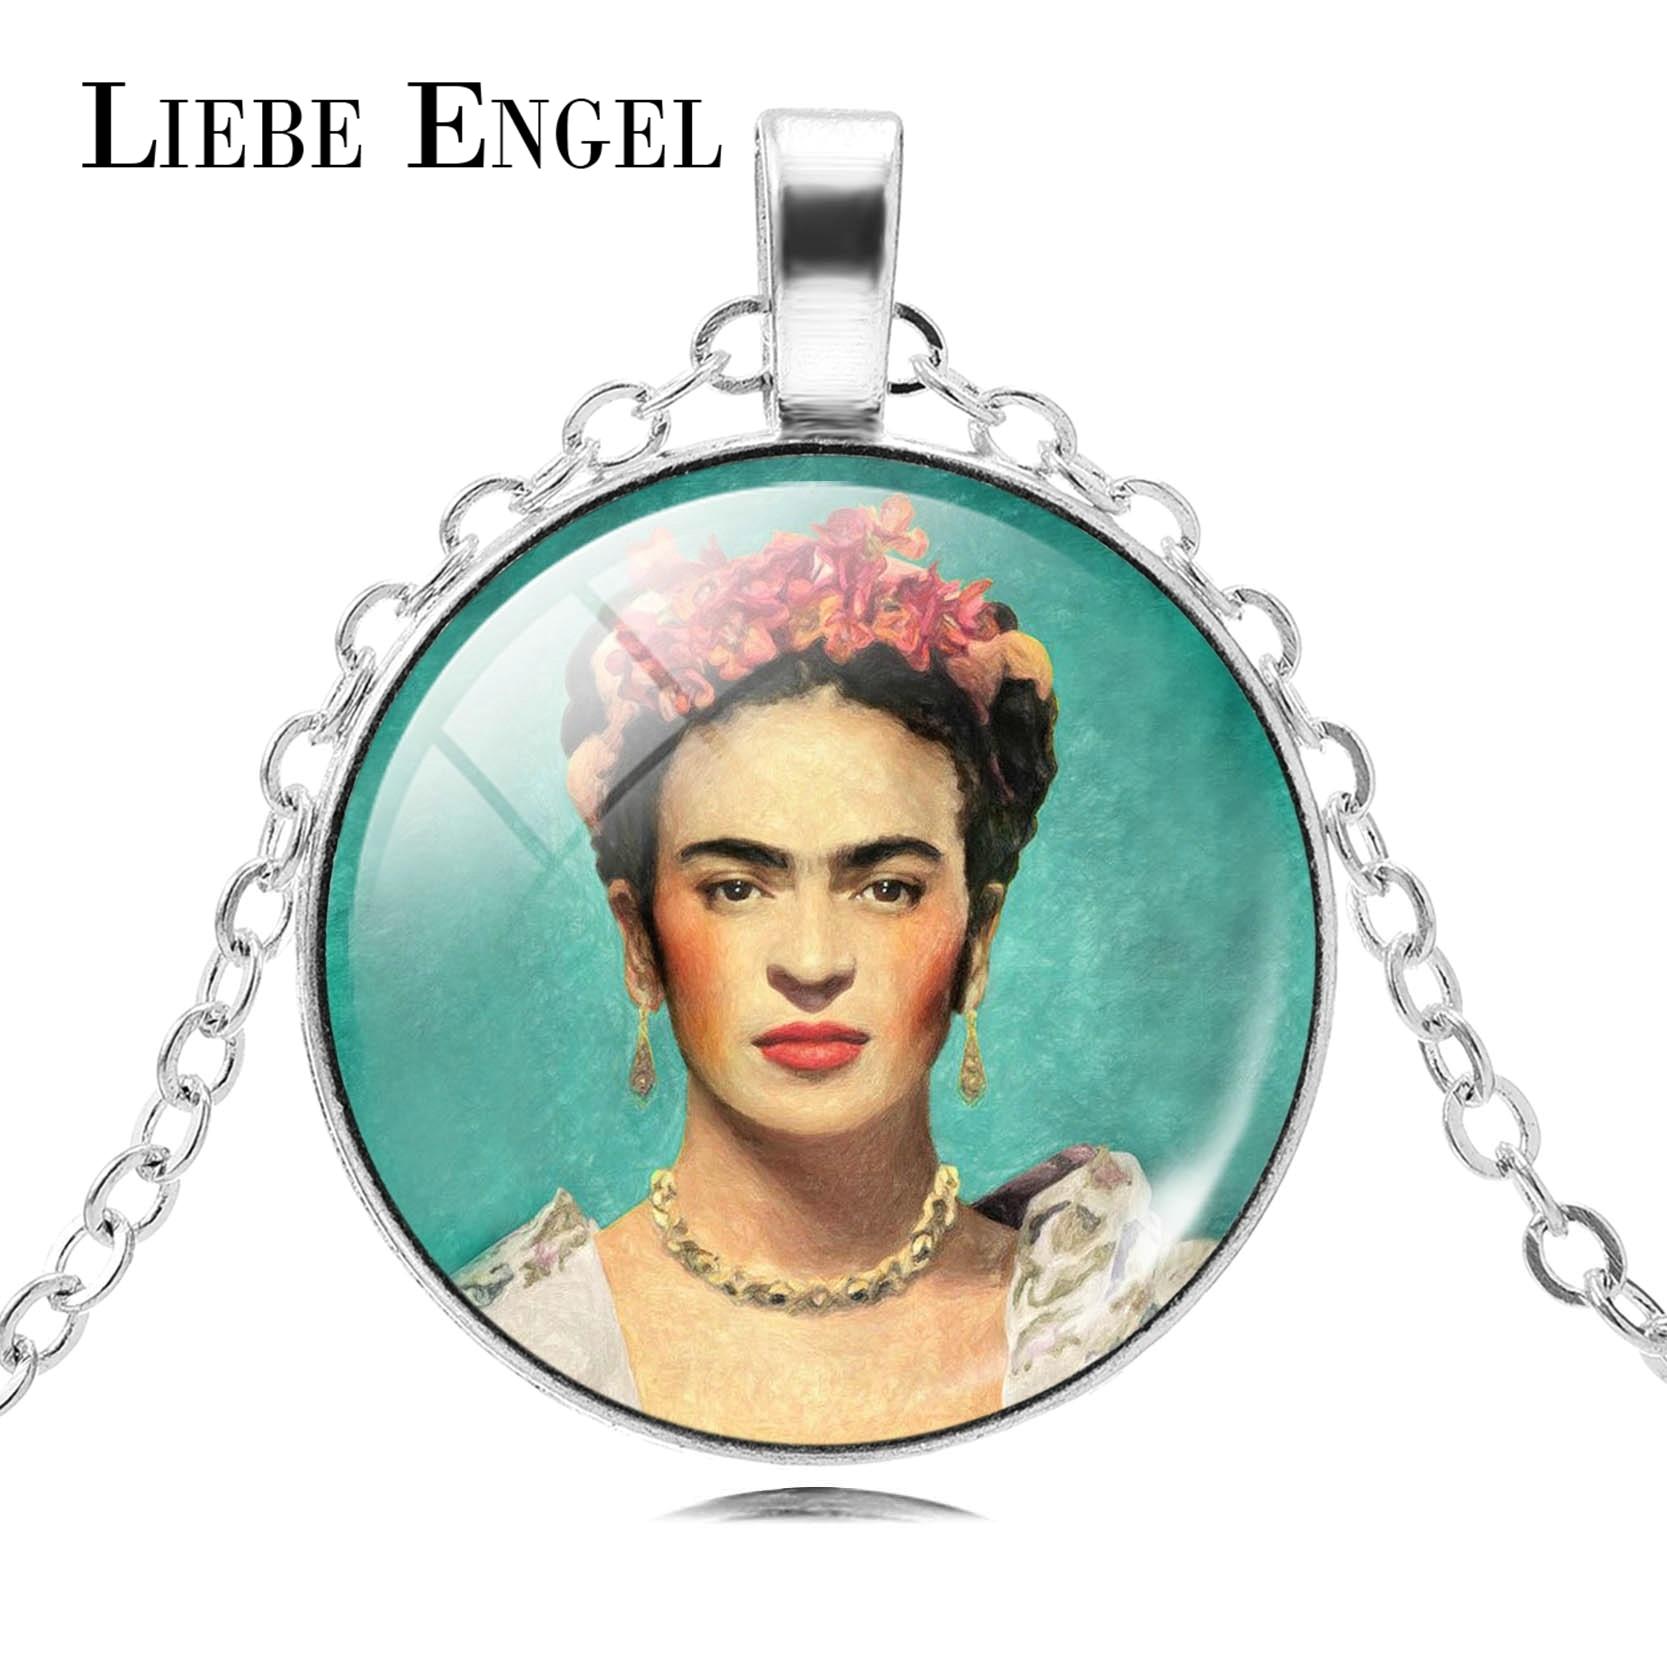 LIEBE ENGEL Frida Kahlo Glass Cabochon Choker Necklace s